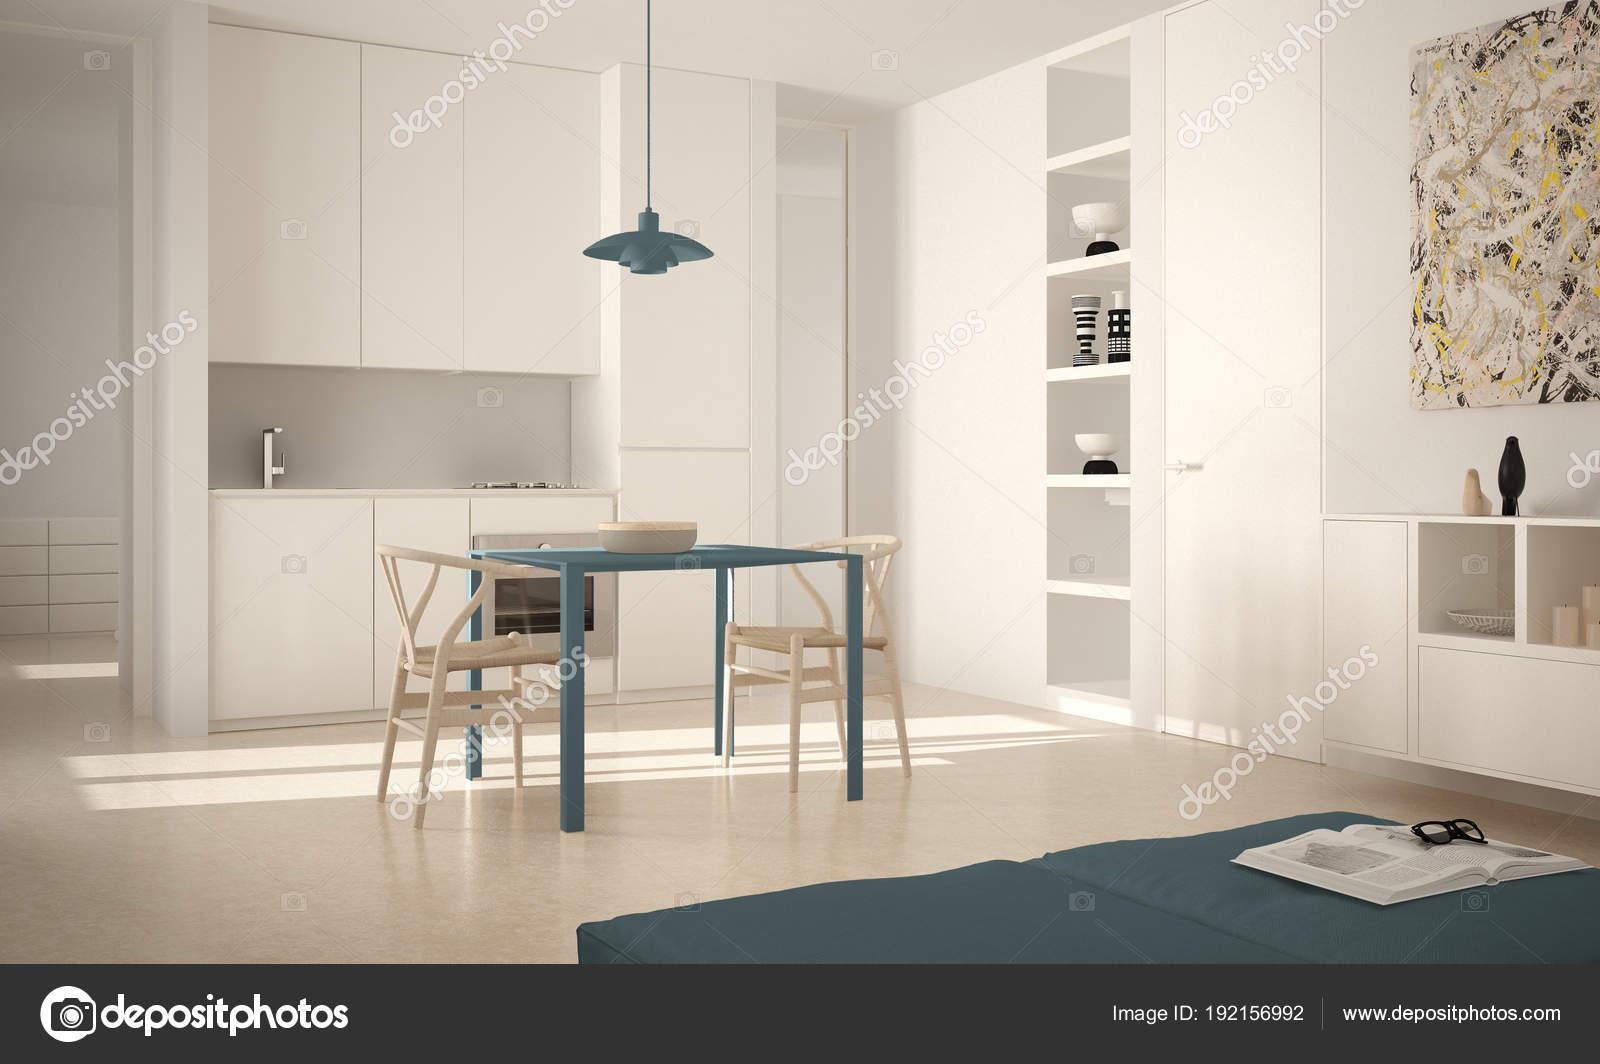 Sedie Blu Cucina : Minimalista moderna luminosa cucina con tavolo da pranzo e sedie